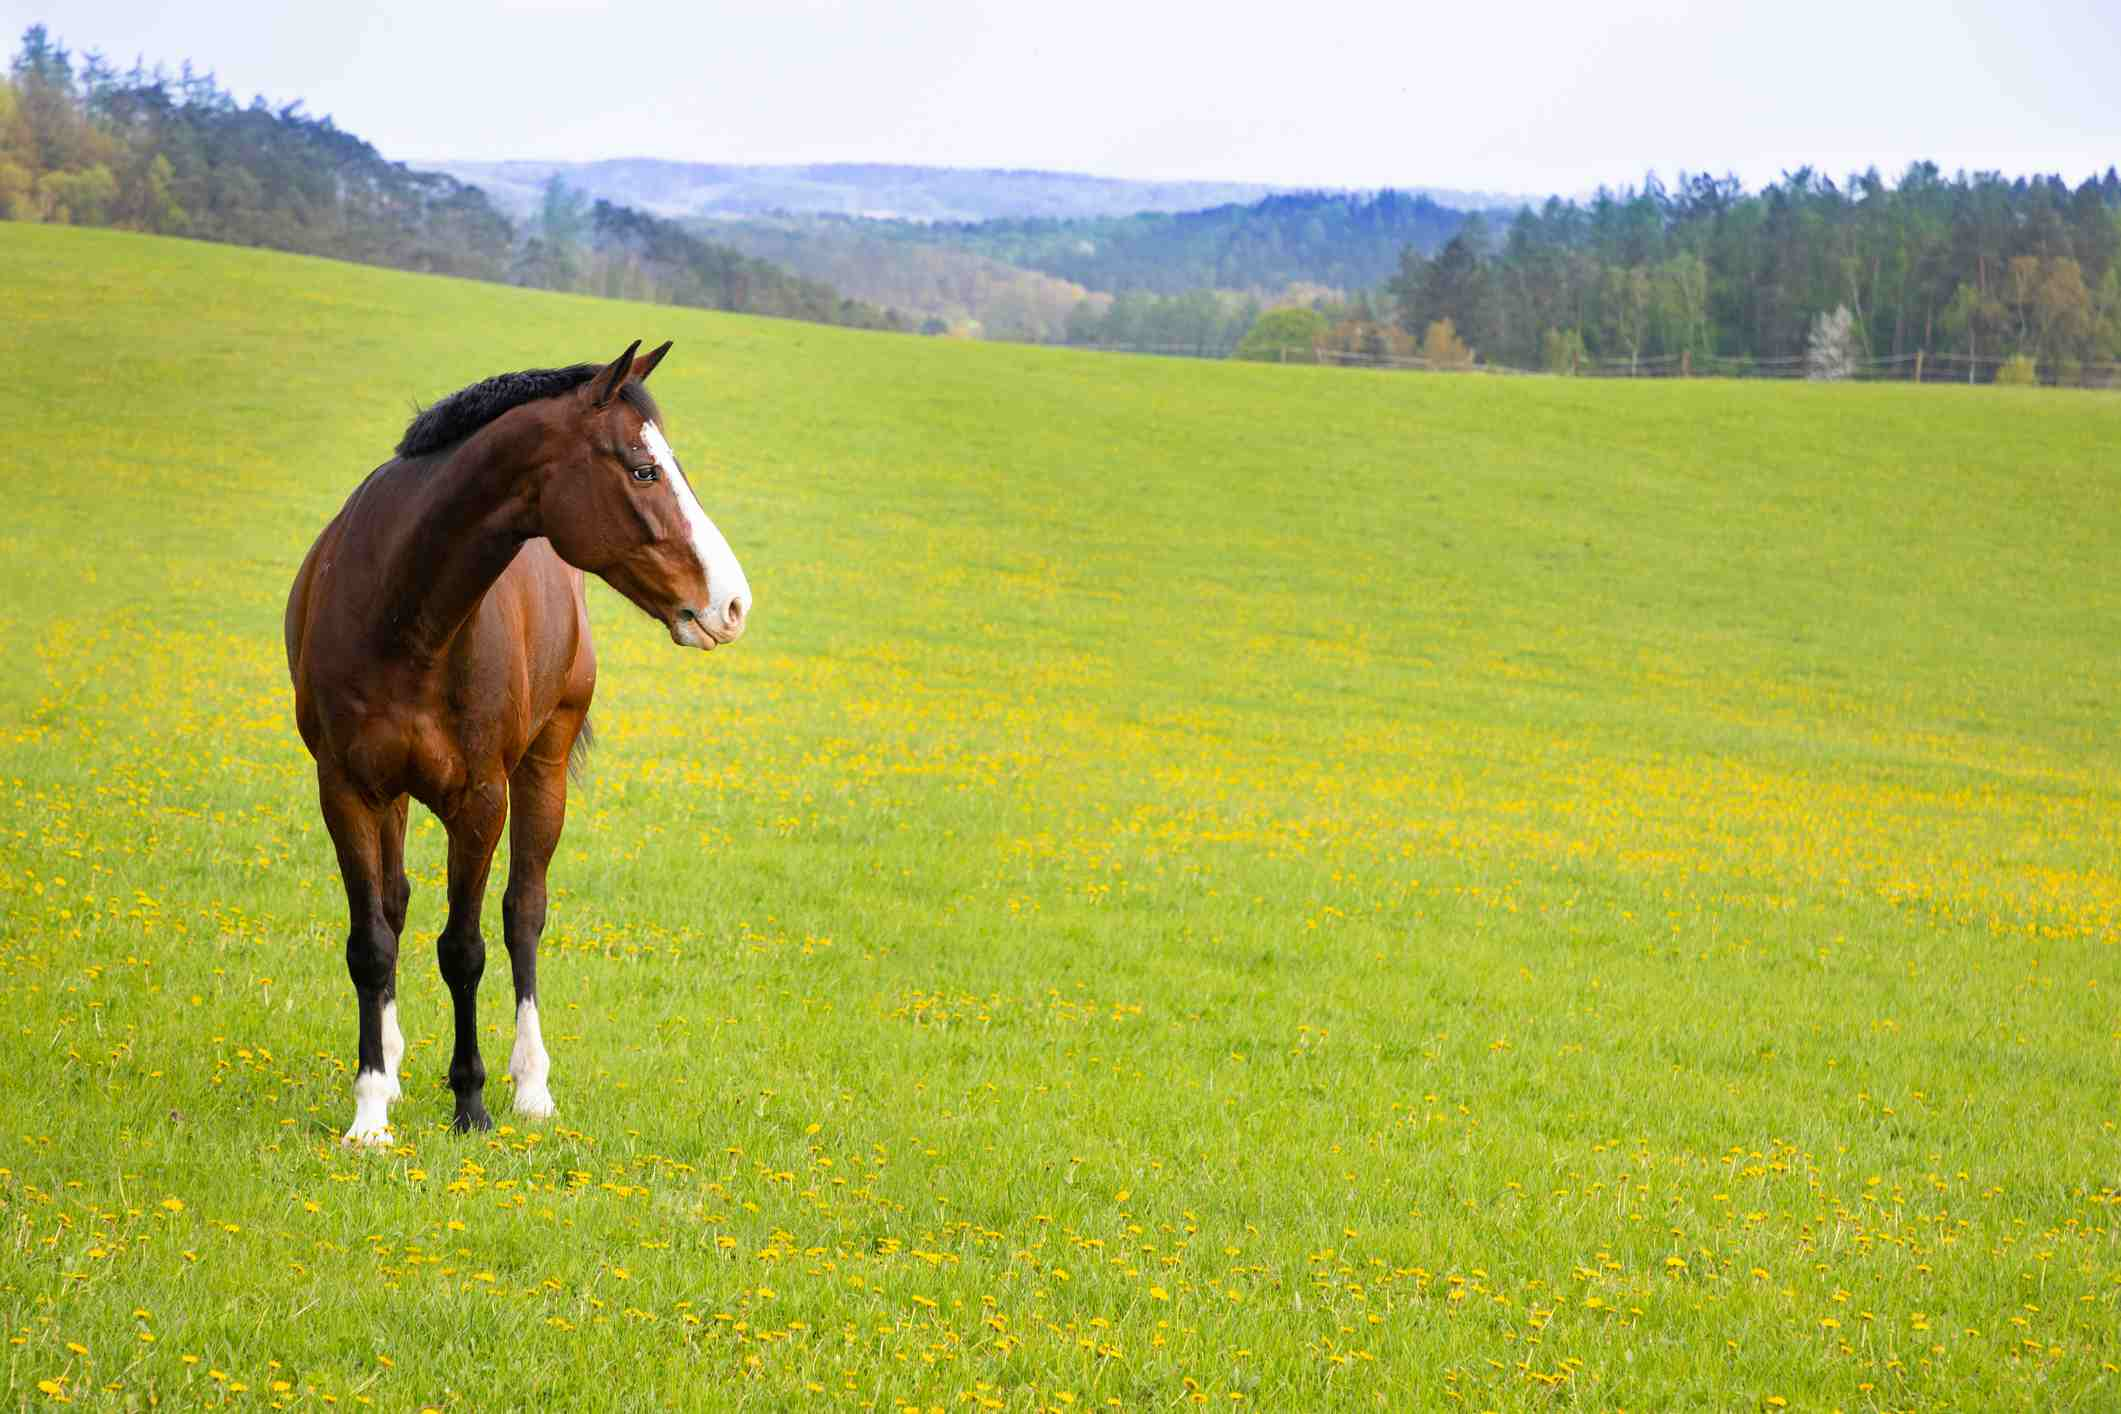 Horse roaming in a grassy field